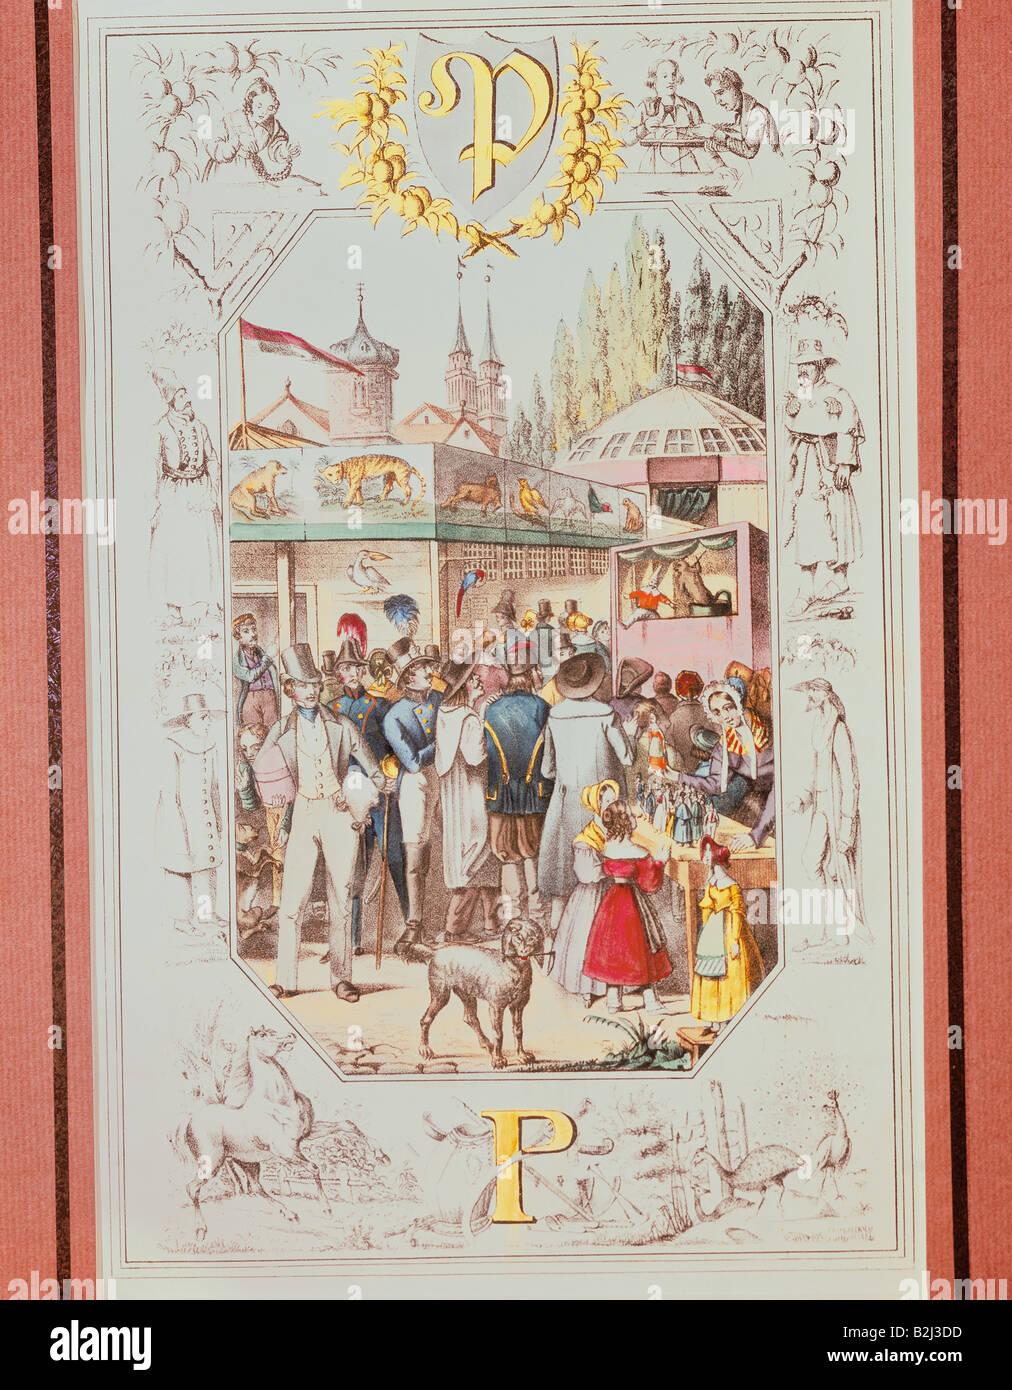 festivities, fairs, fair scene, illustrated alphabet, Germany, circa 1820, Additional-Rights-Clearances-NA - Stock Image